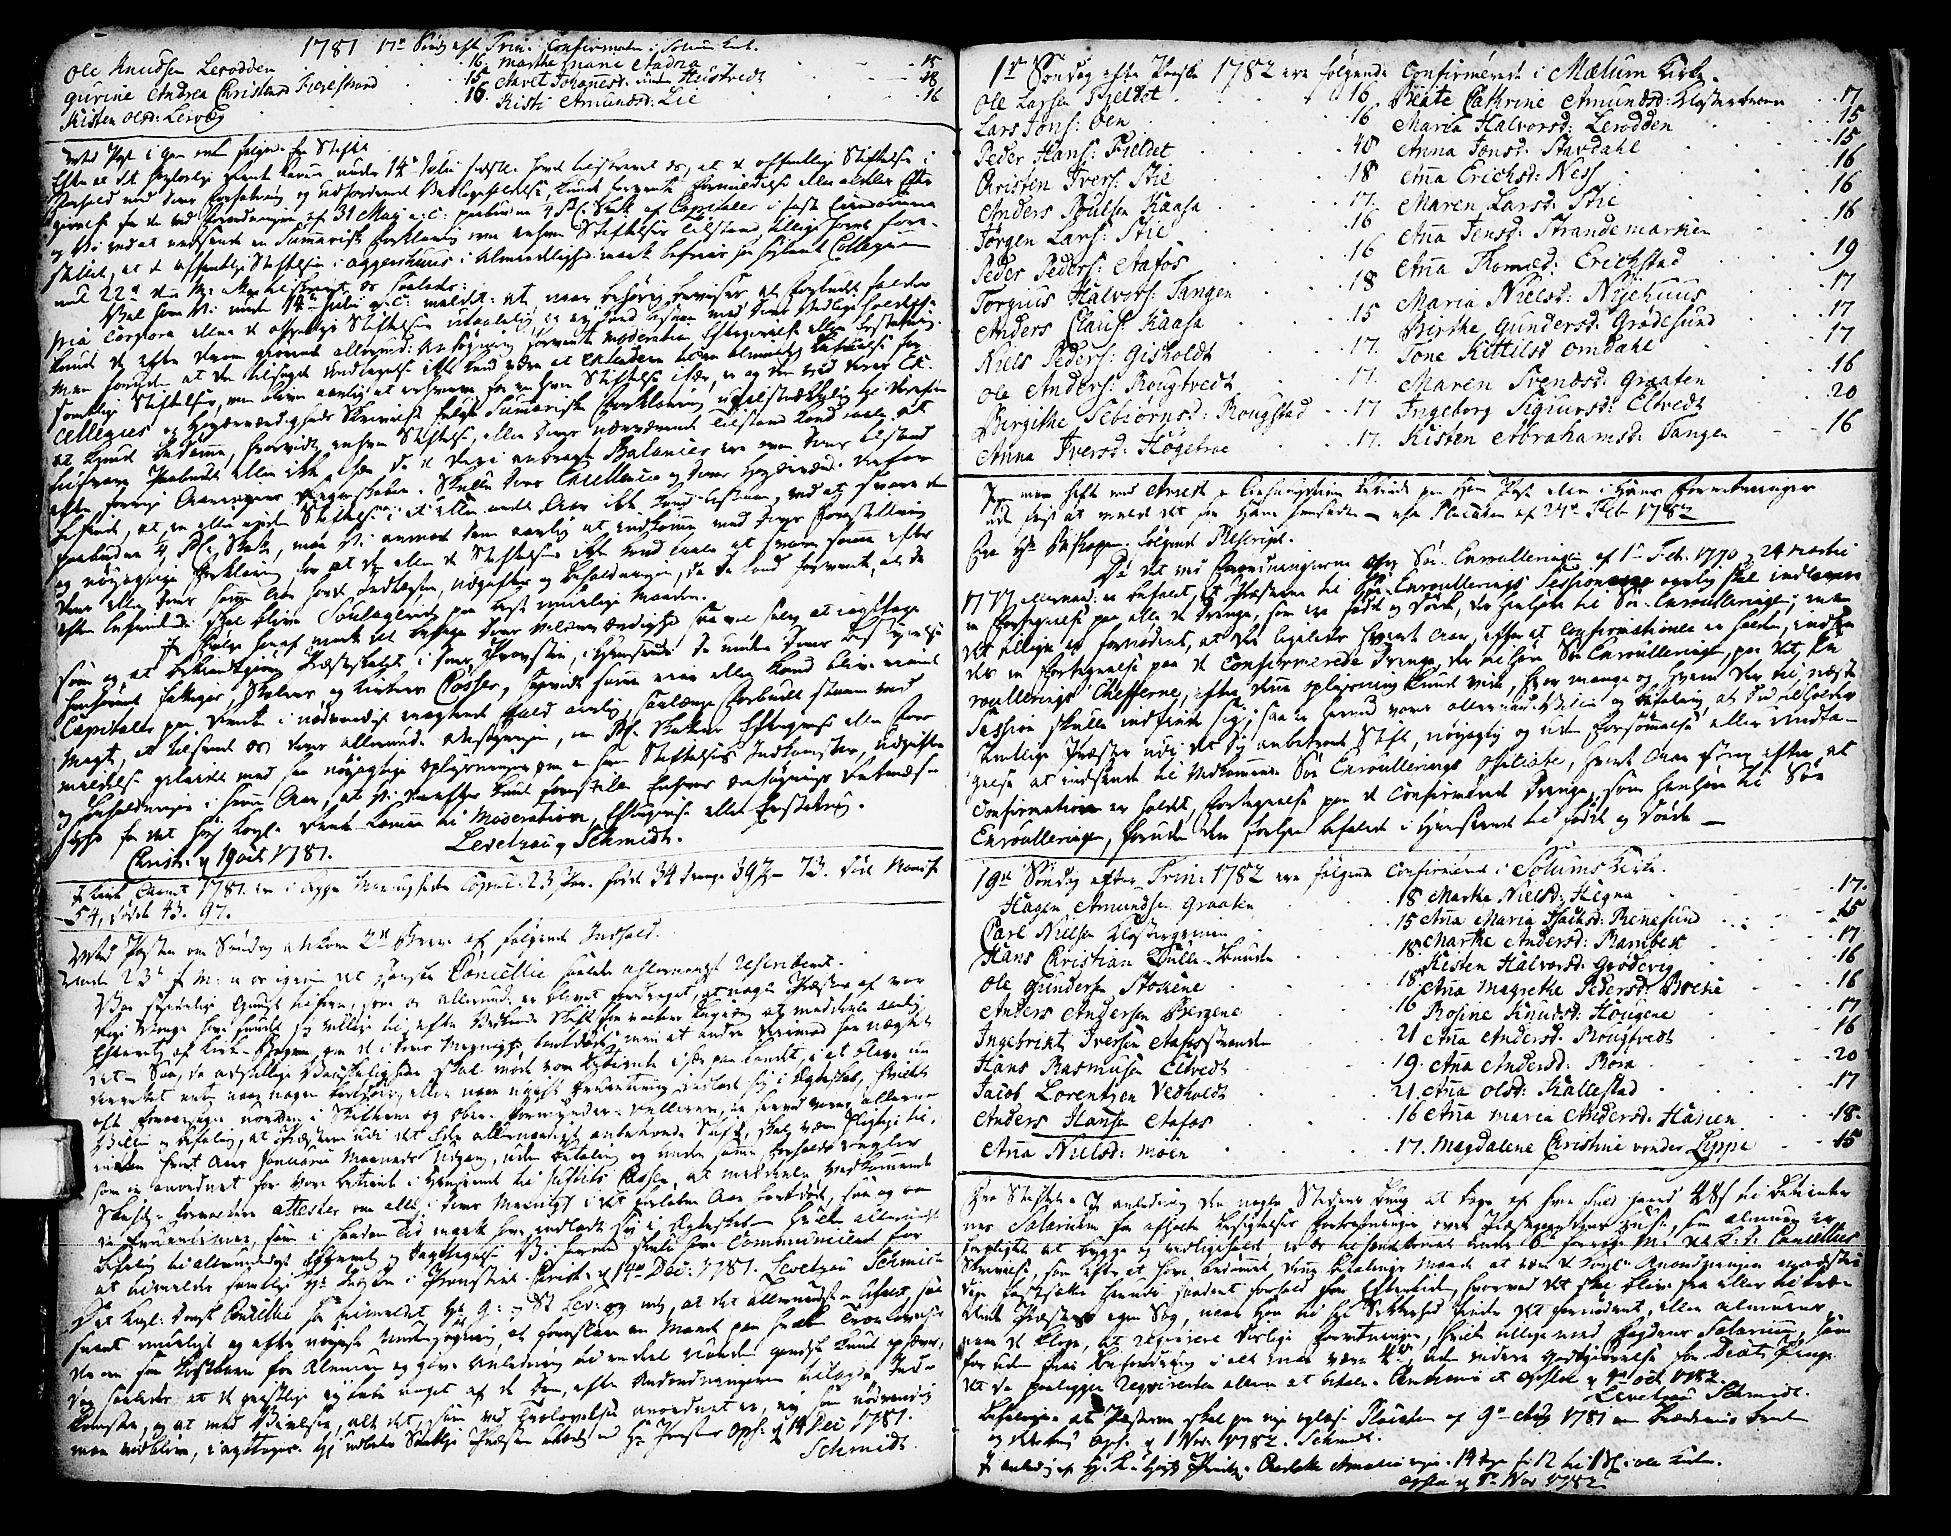 SAKO, Solum sokneprestkontor, A/Aa/L0002: Annen kirkebok nr. 2, 1743-1791